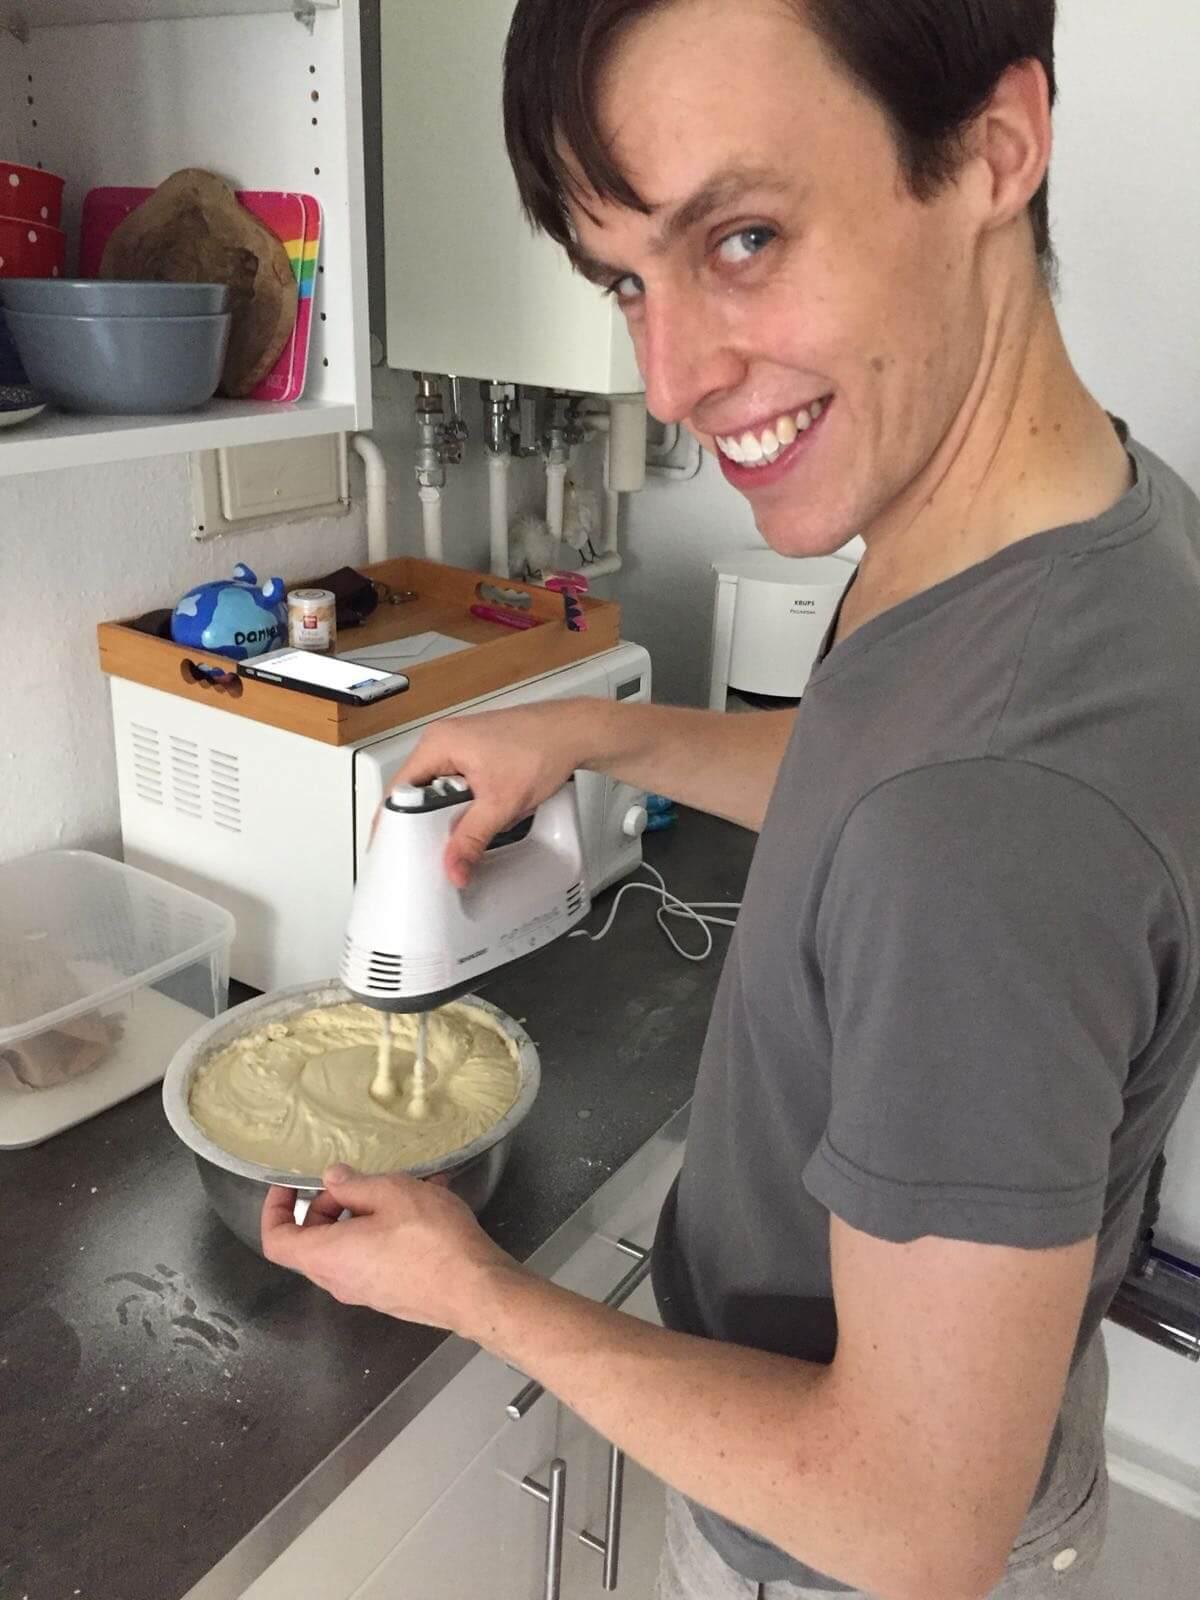 Daniel mixing a cake